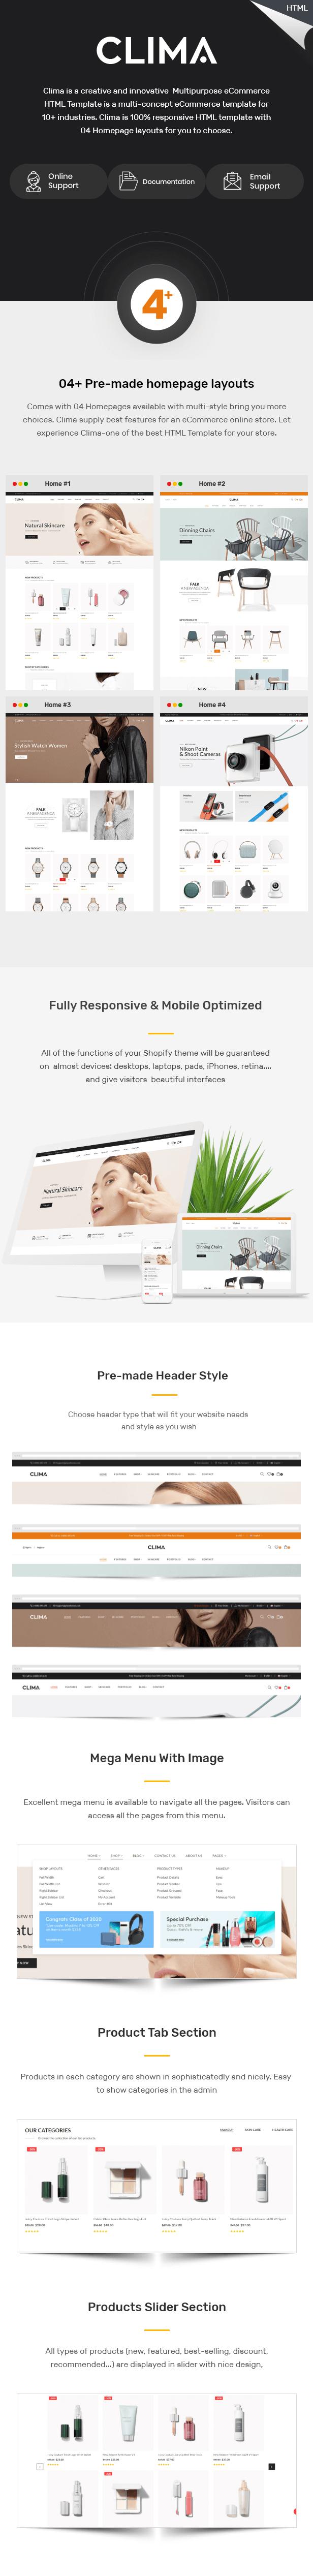 Clima - Multipurpose eCommerce HTML Template